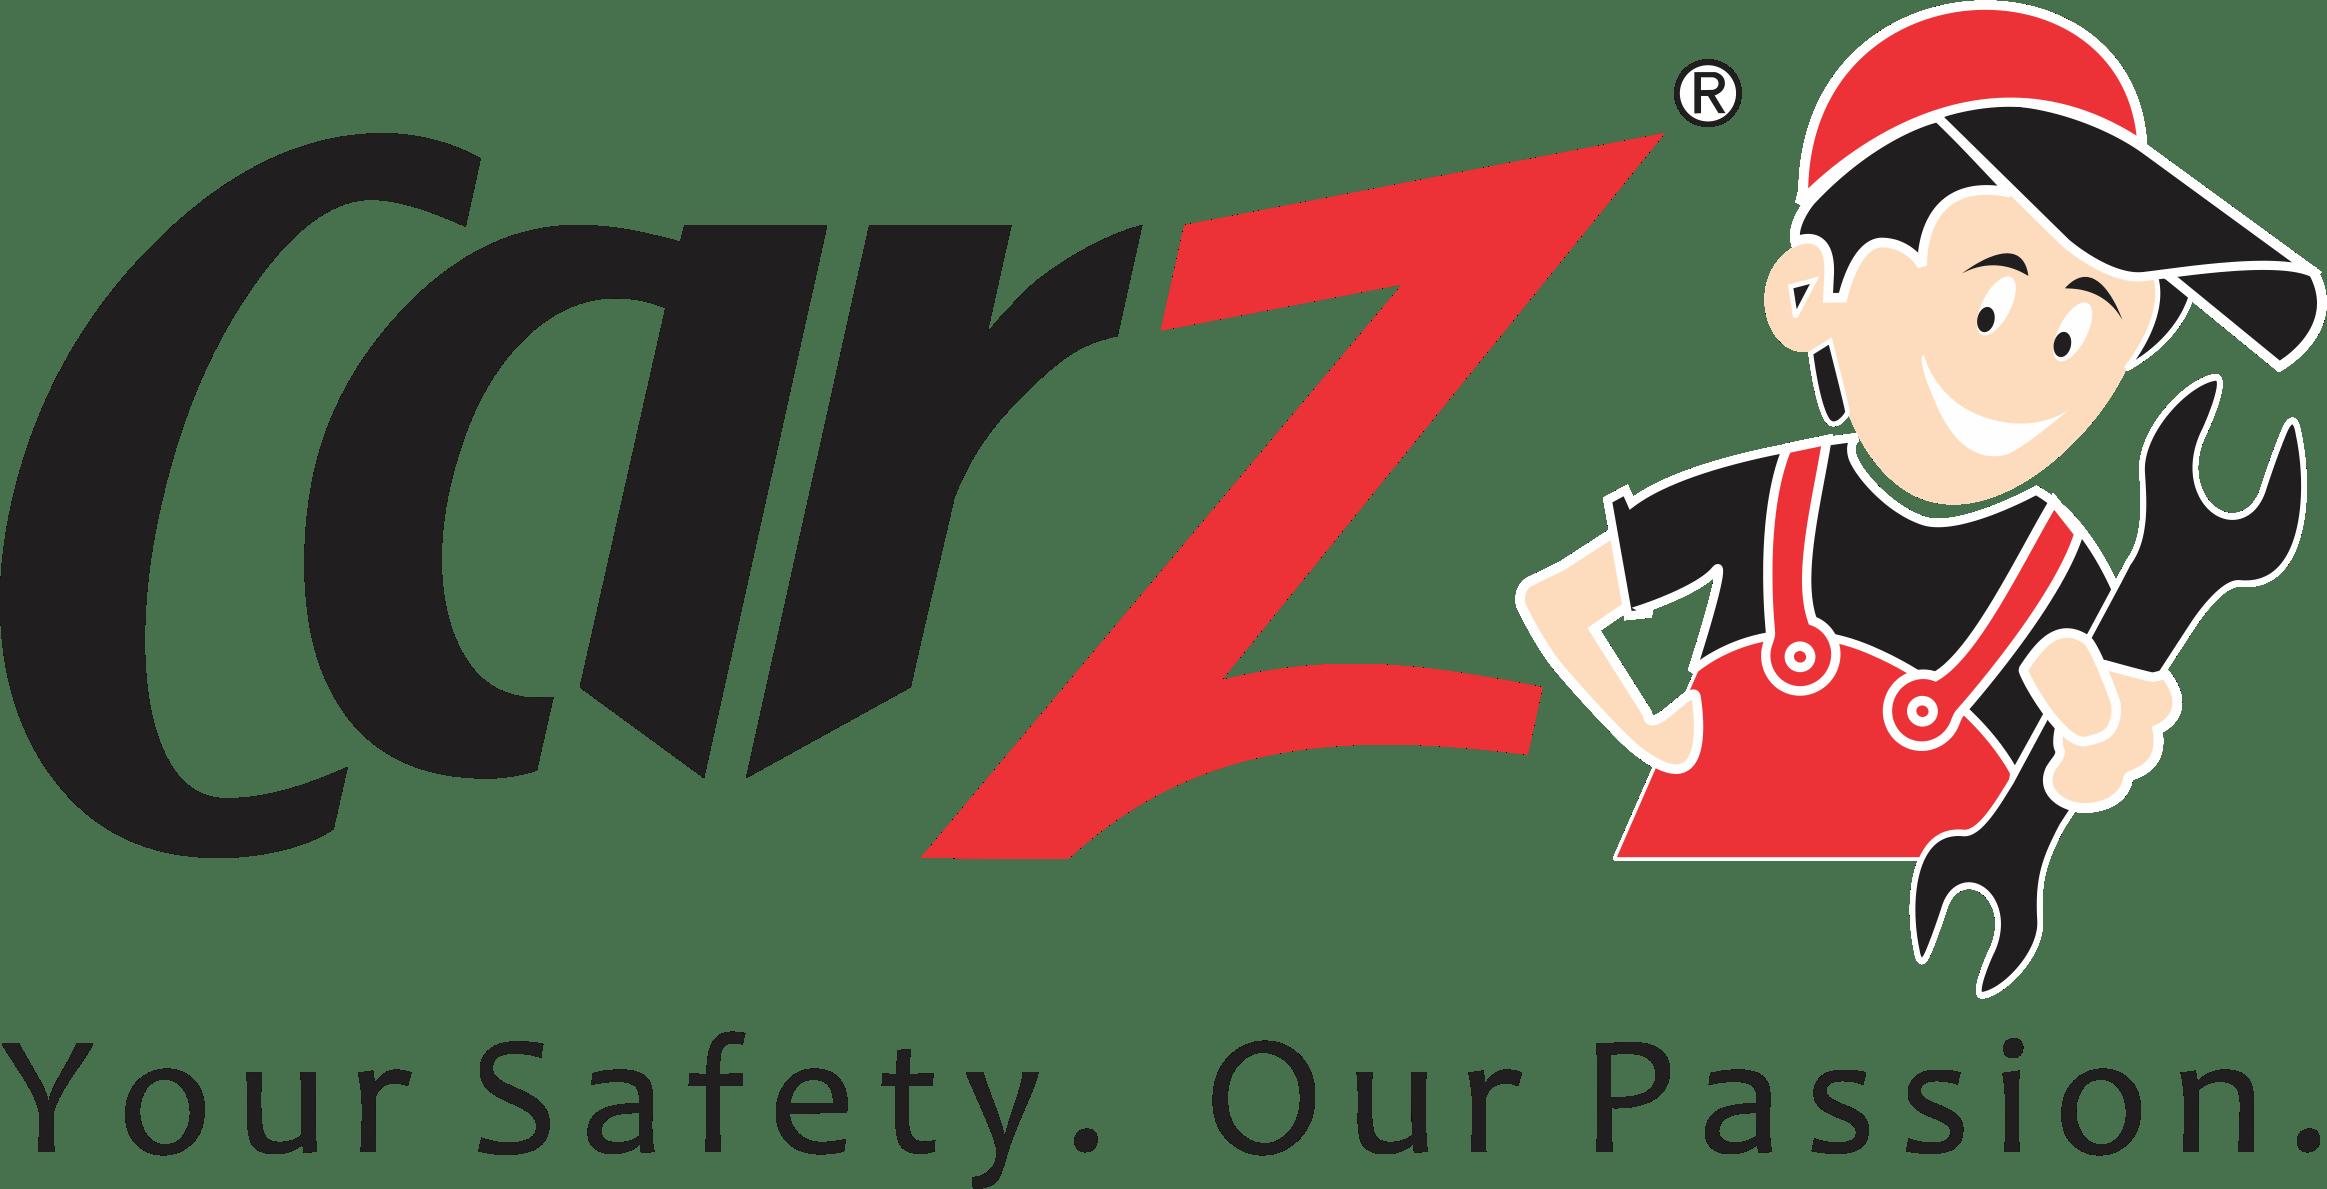 CarZ Multibrand Car Repairs And Servicing In Hyderabad - Carz